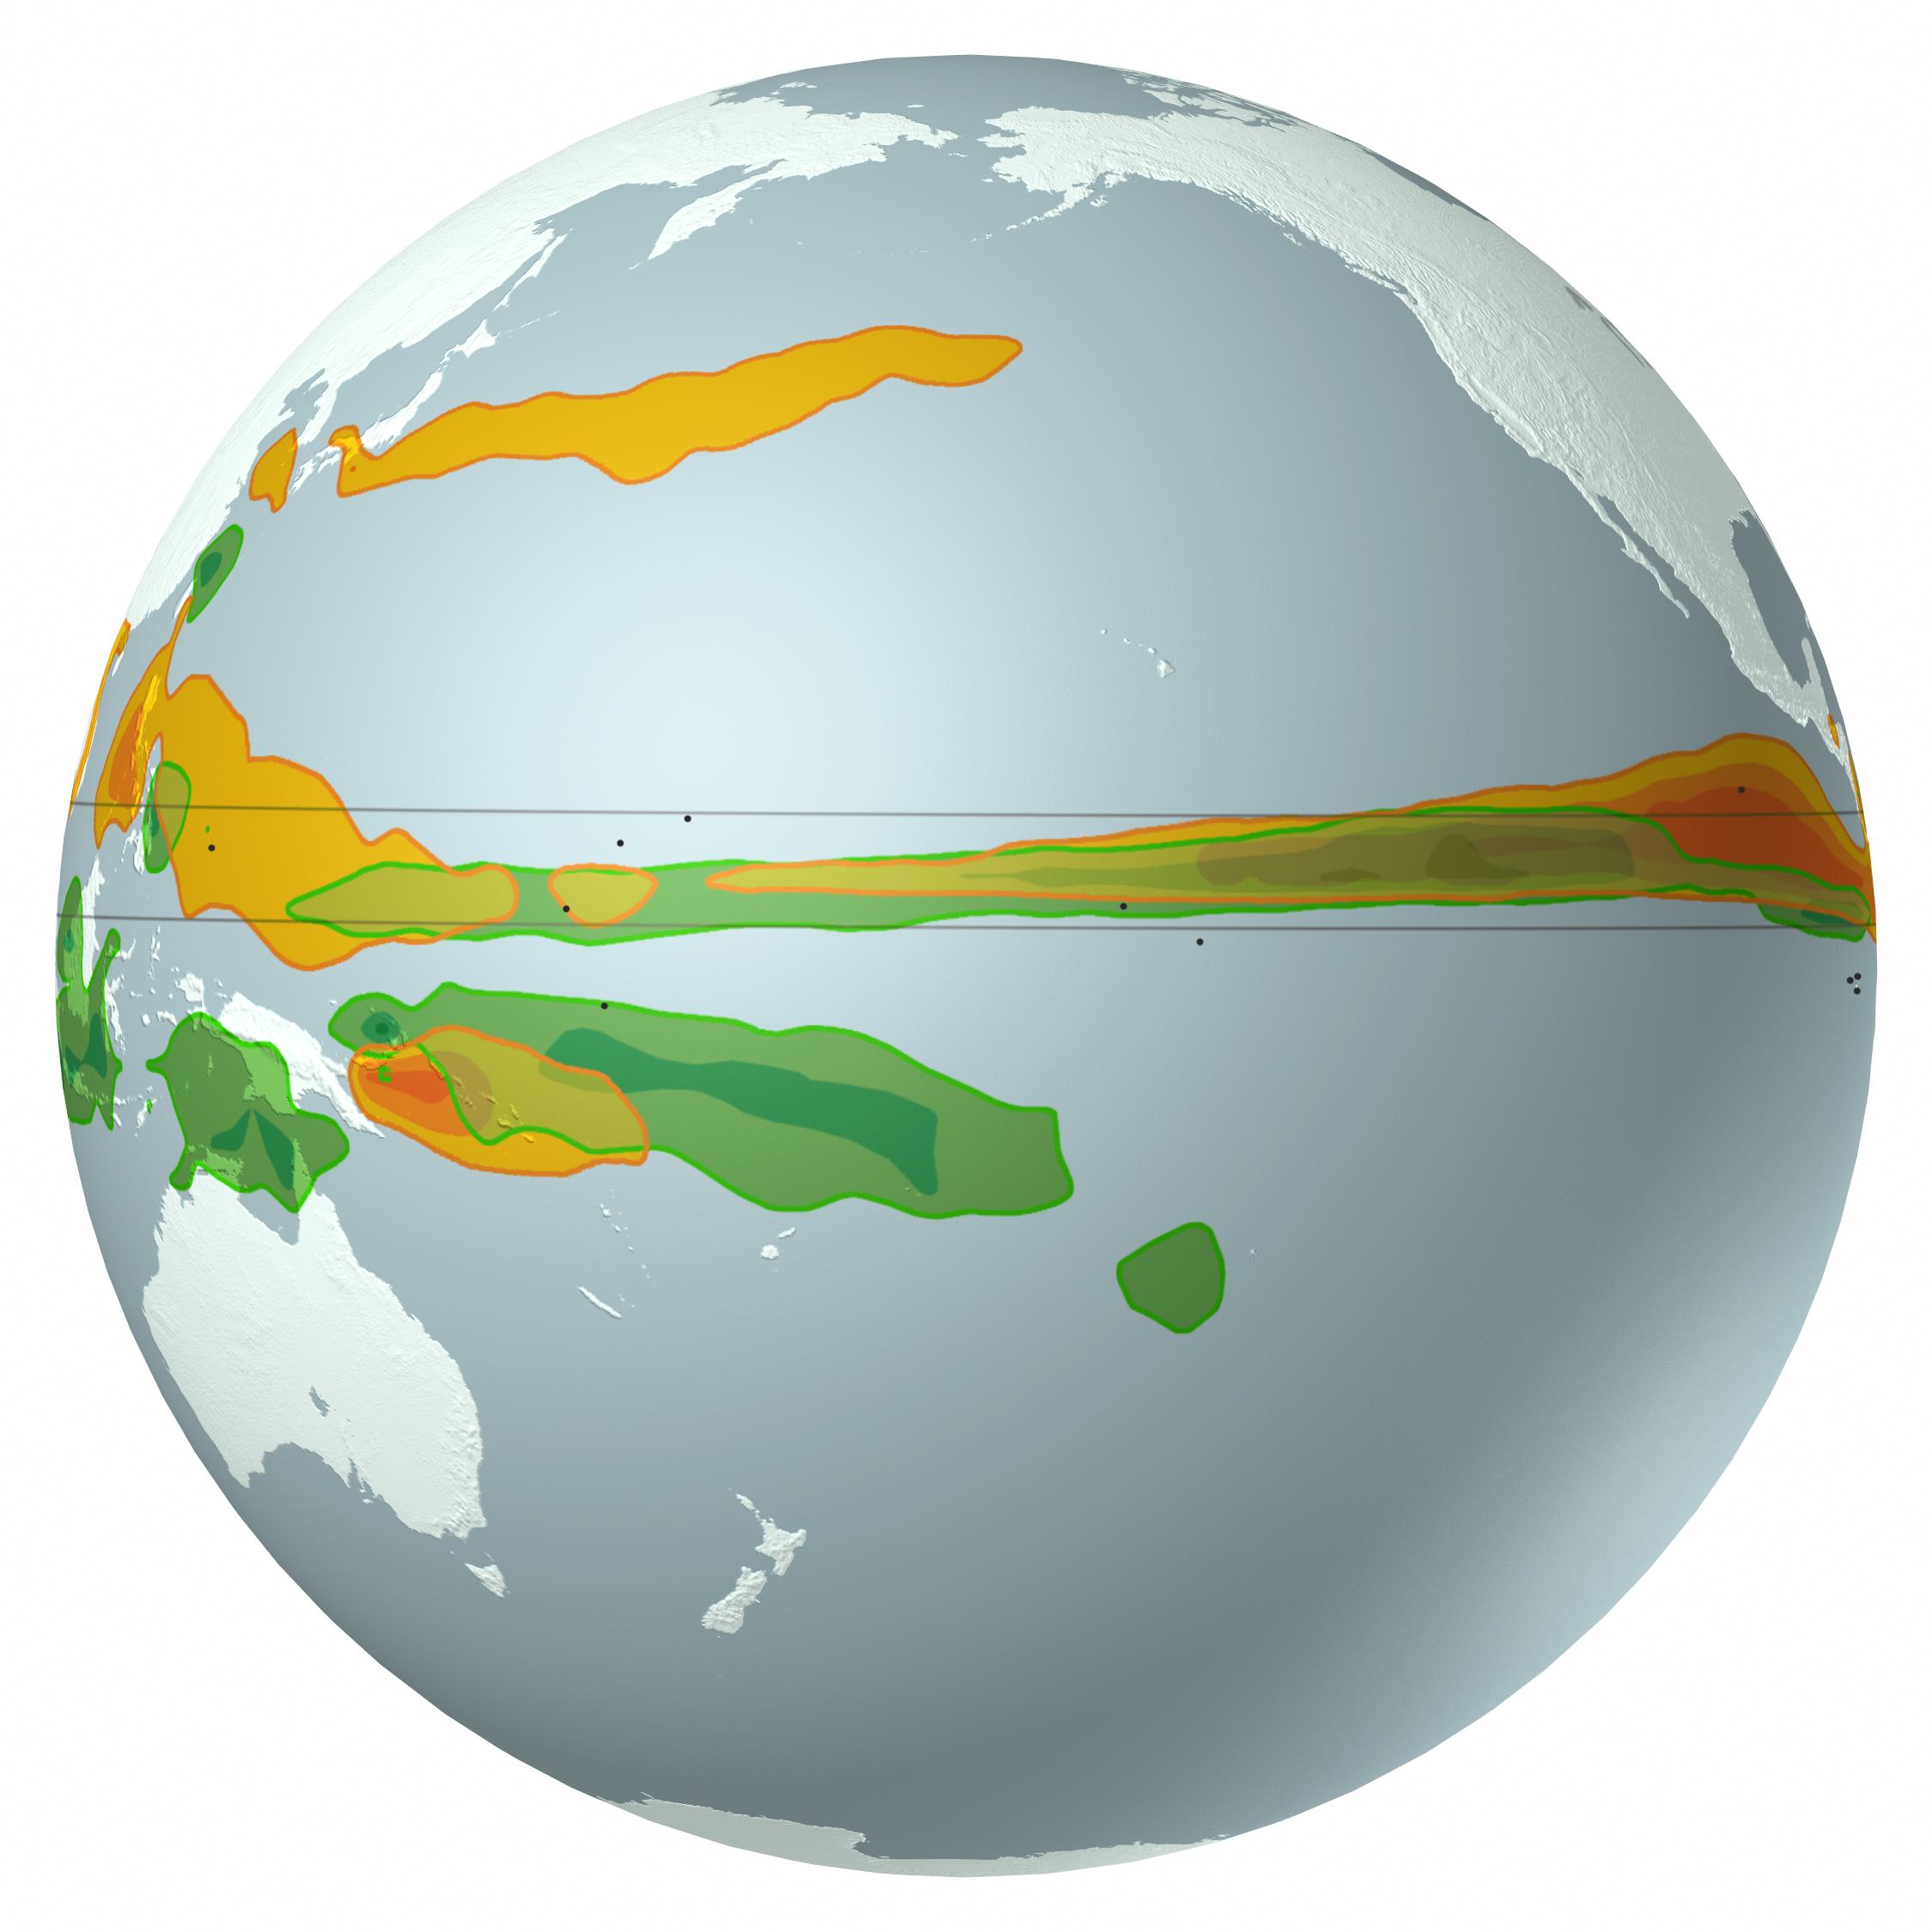 Scientific American - Rainfall globes